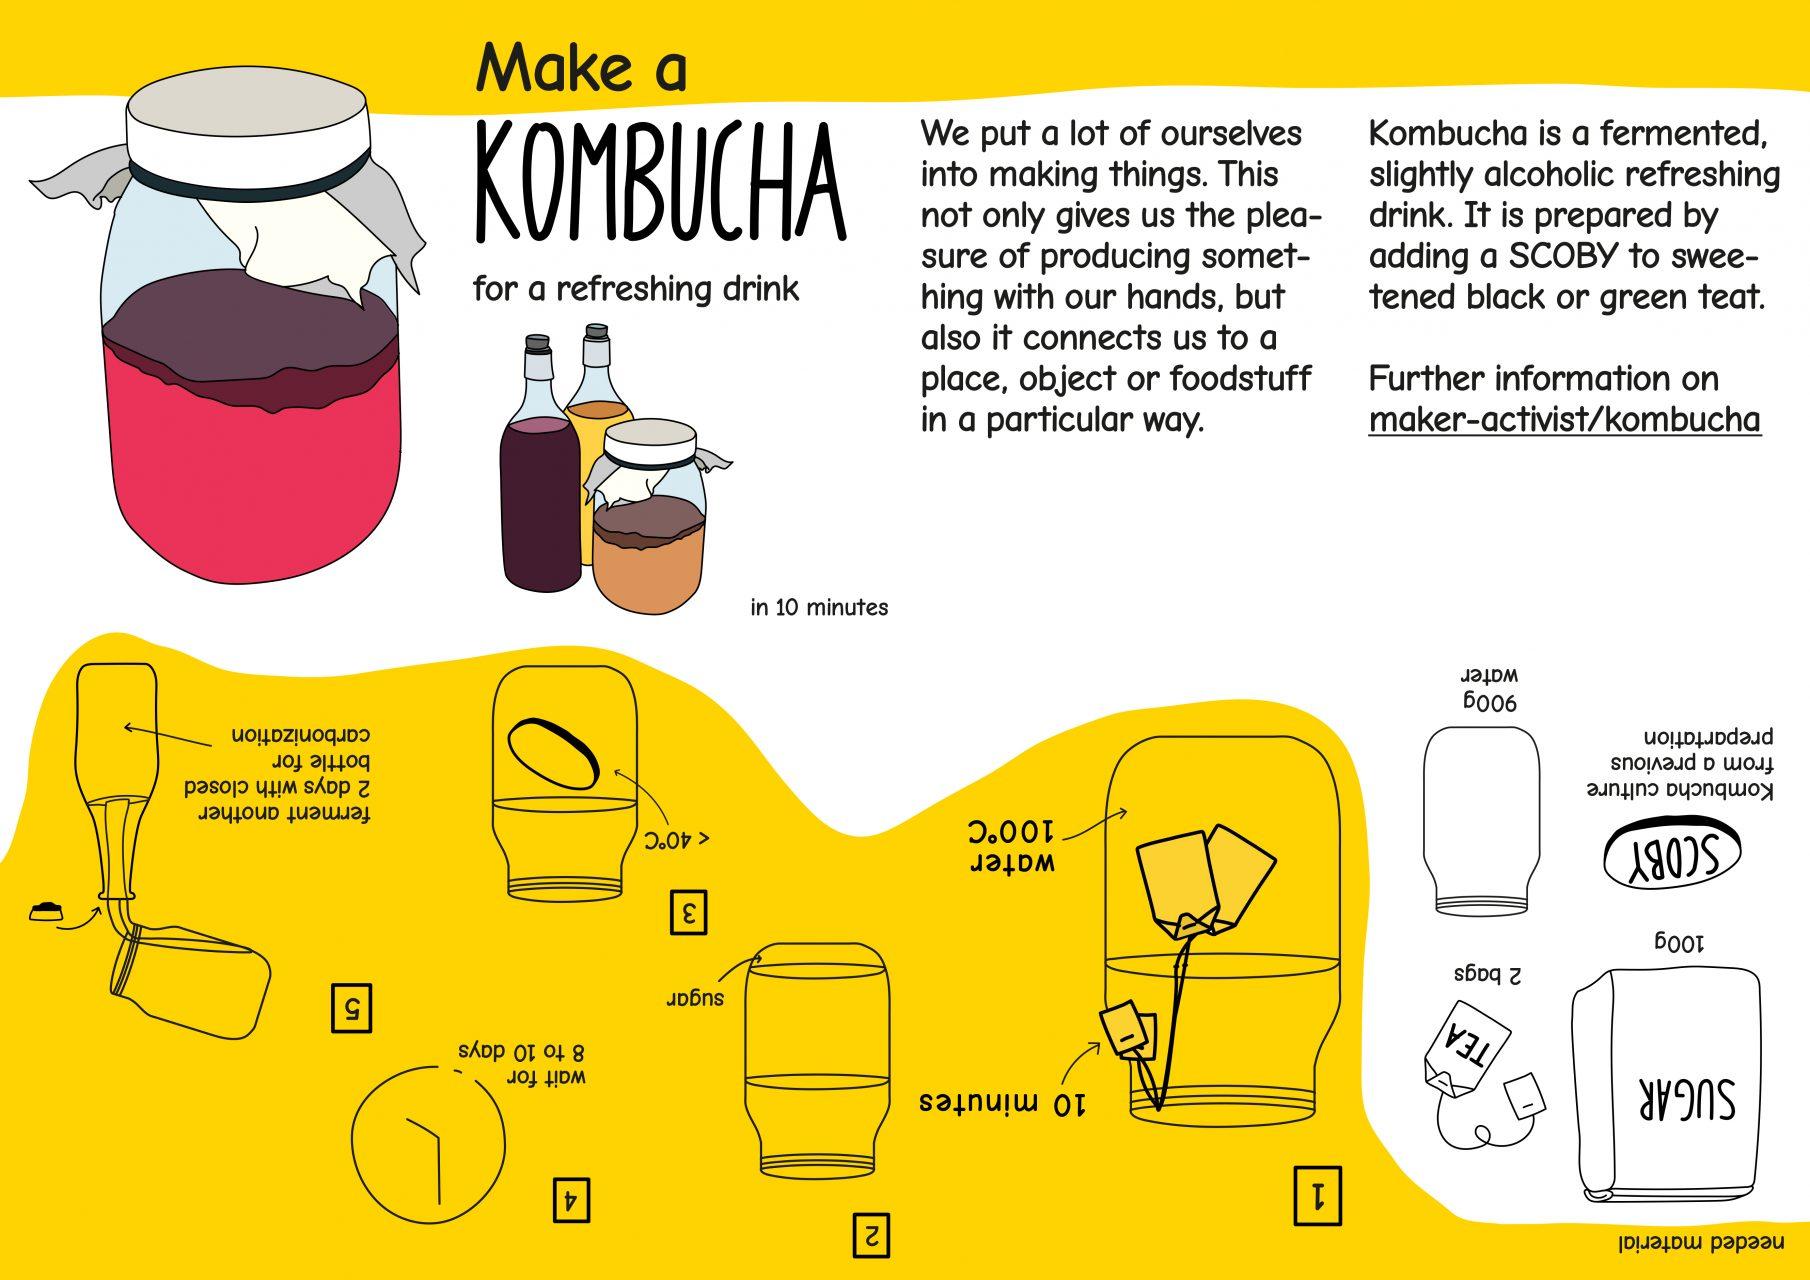 instructions how to make kombucha